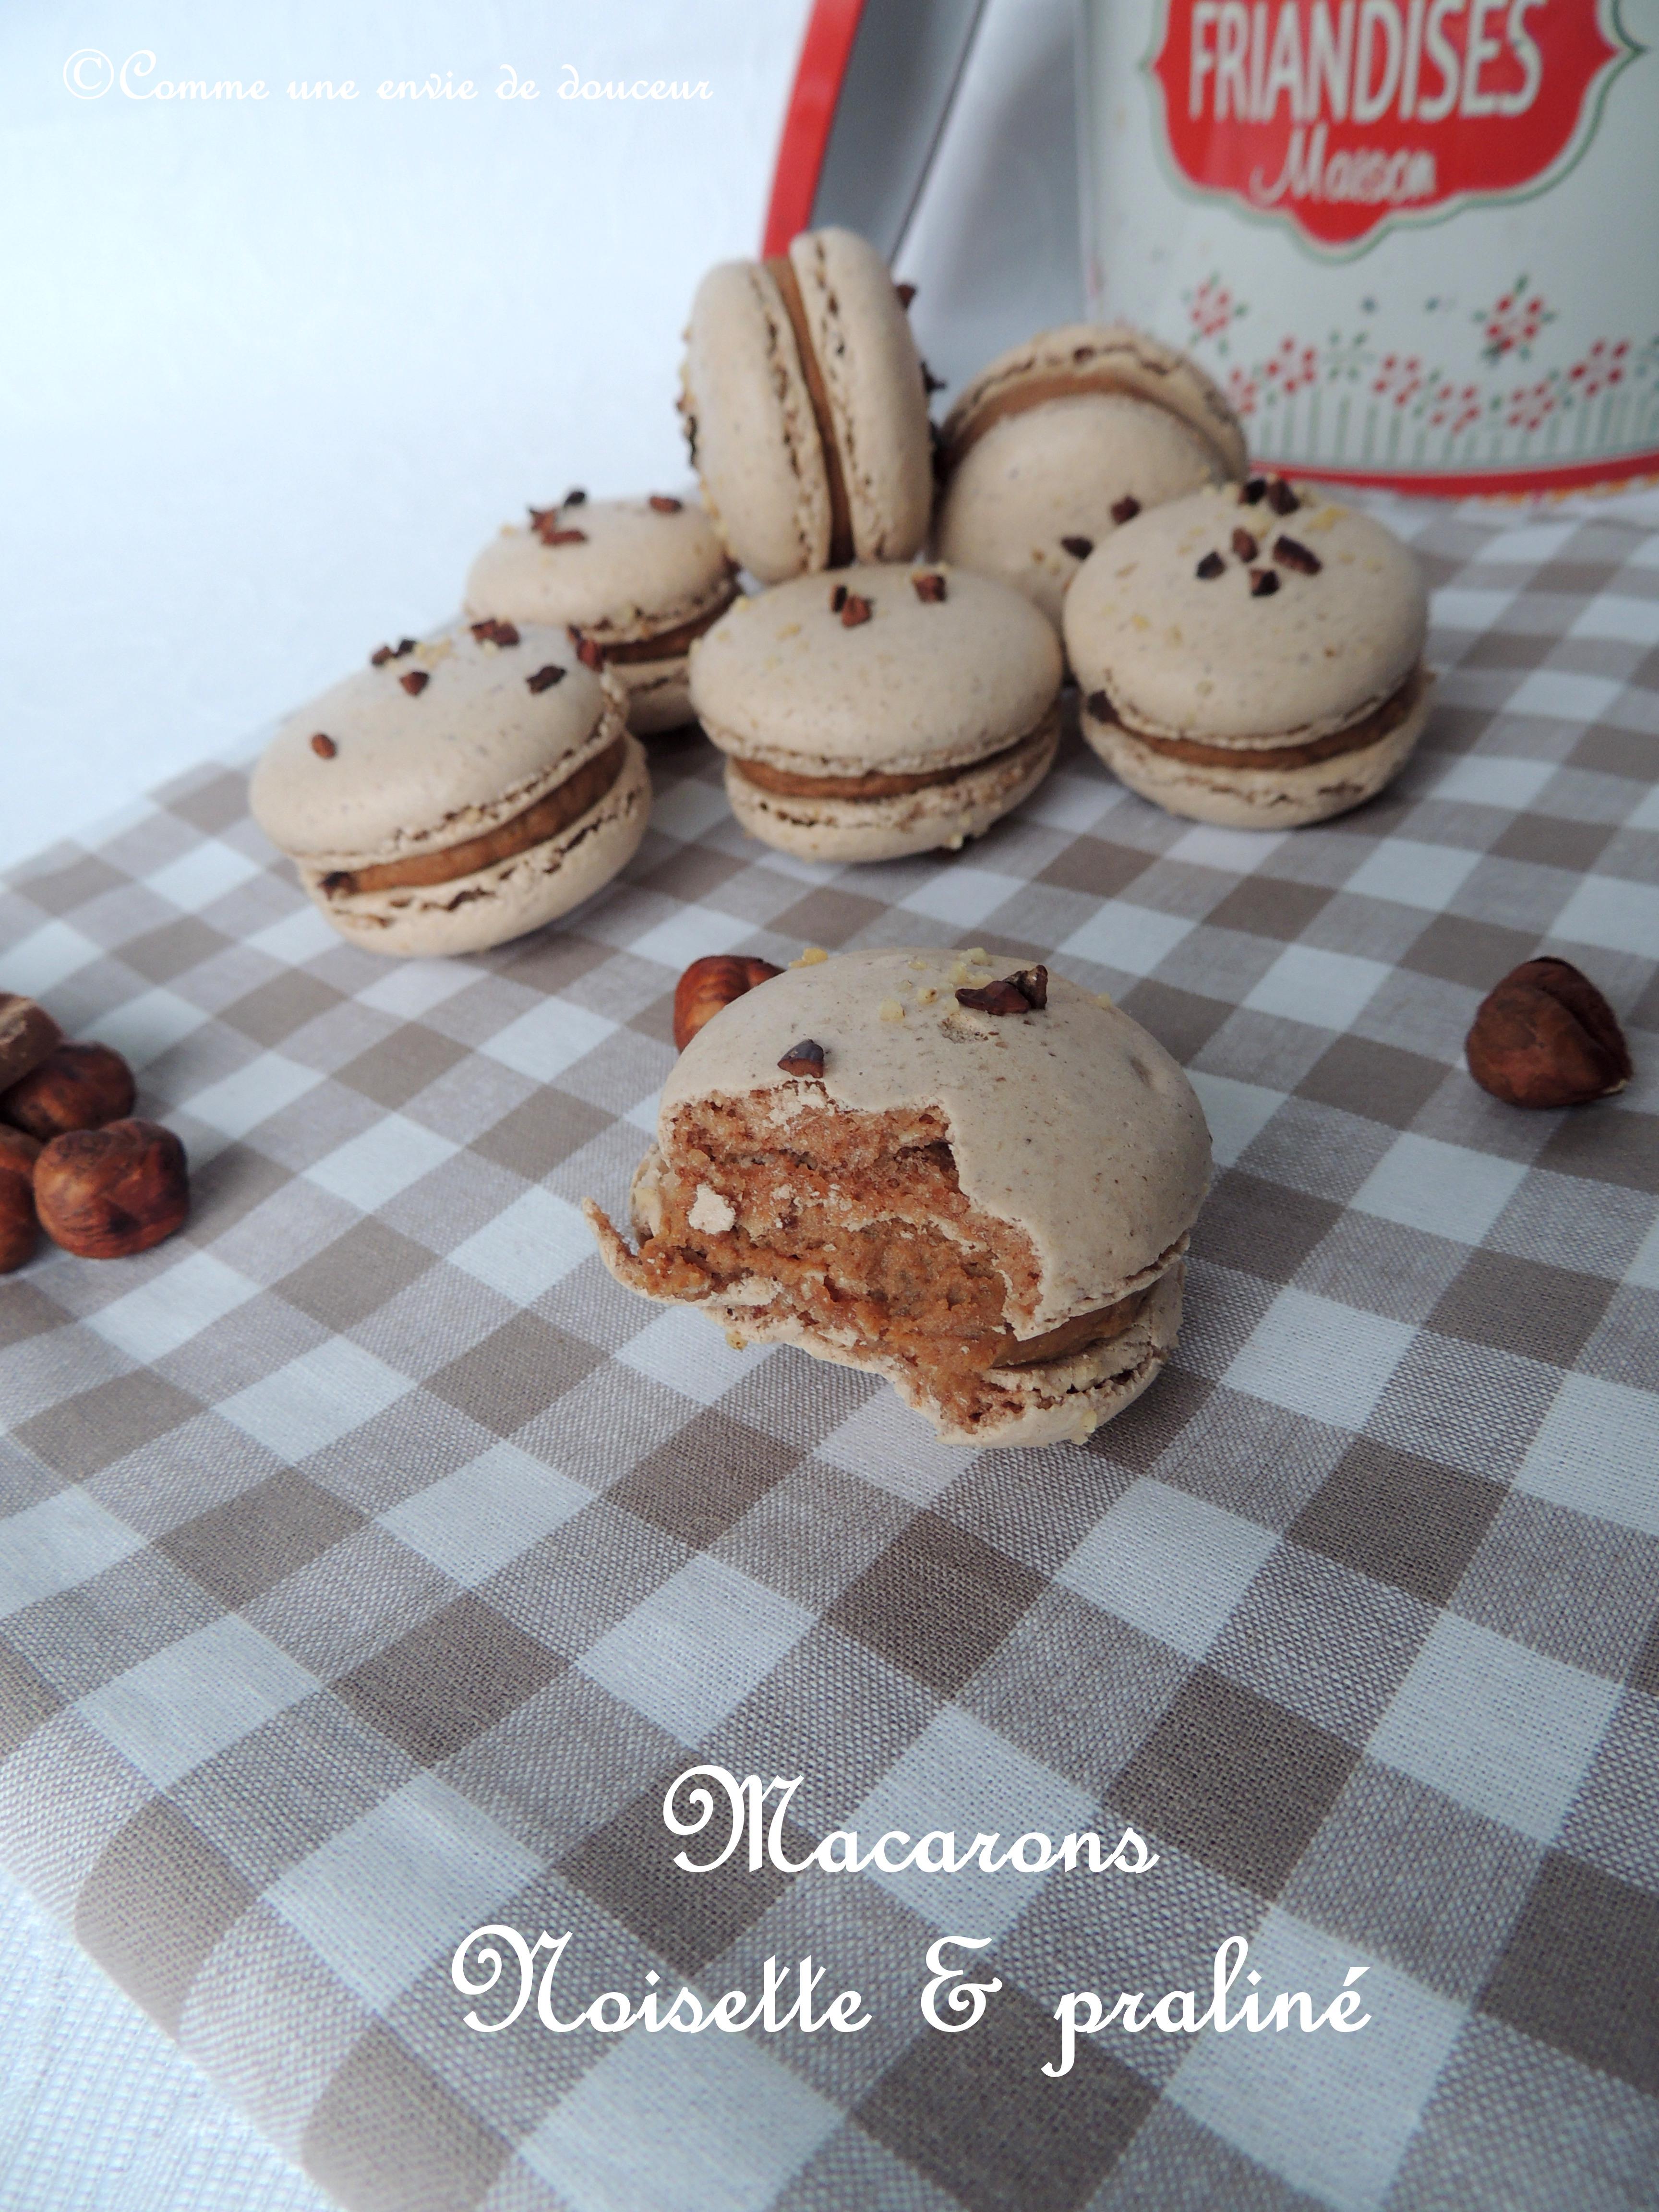 Macarons noisette, ganache praliné – Hazelnut and praliné macarons